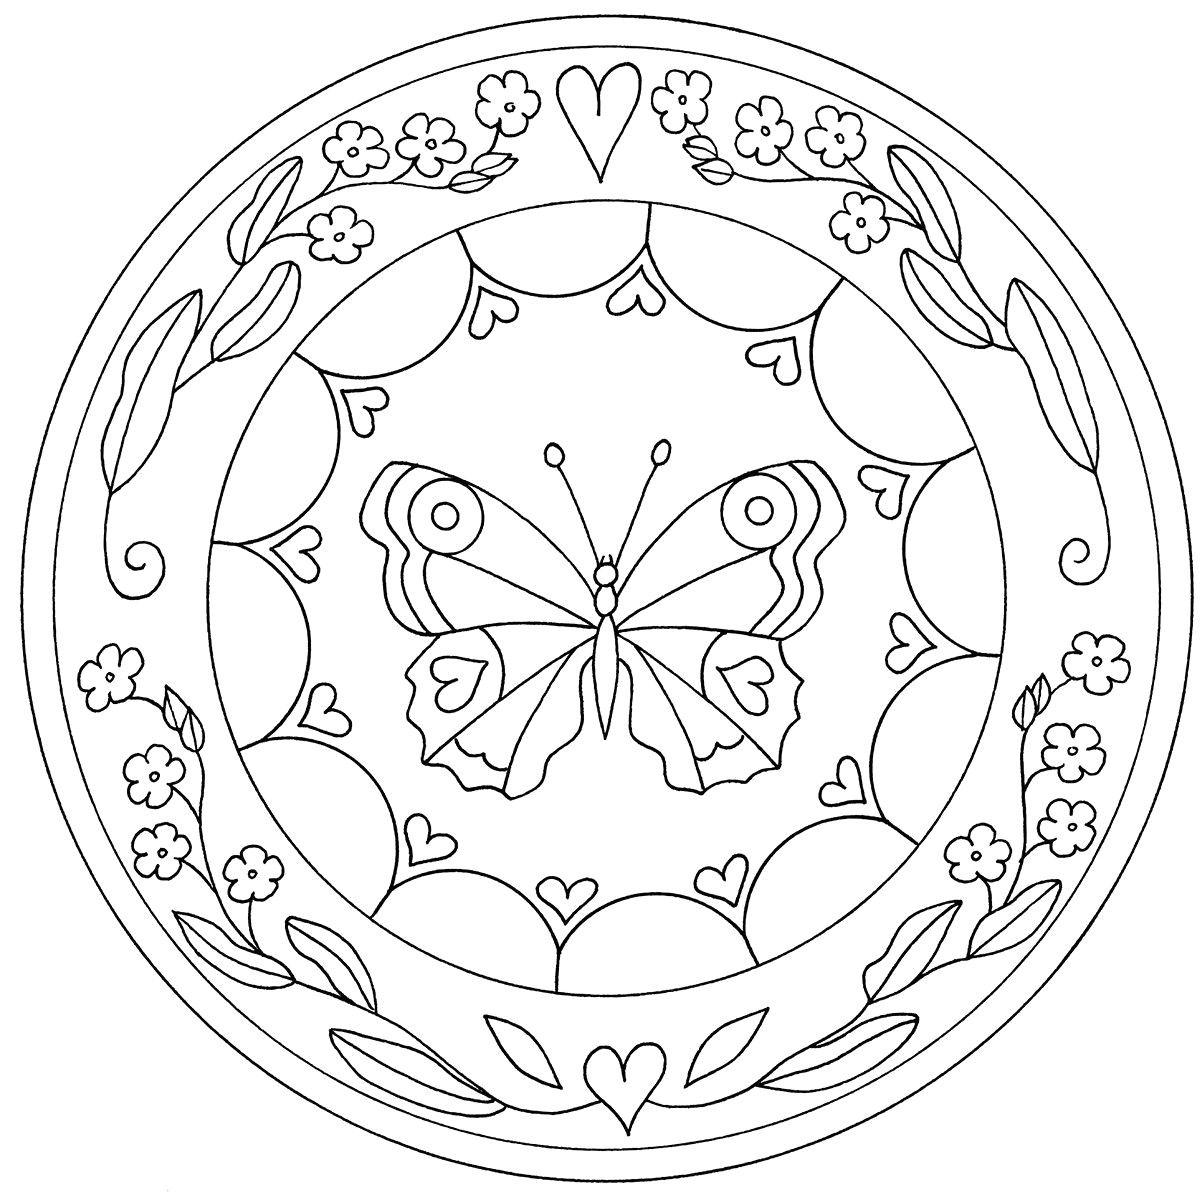 Mandala zum Ausdrucken  Mandala zum ausdrucken, Mandala